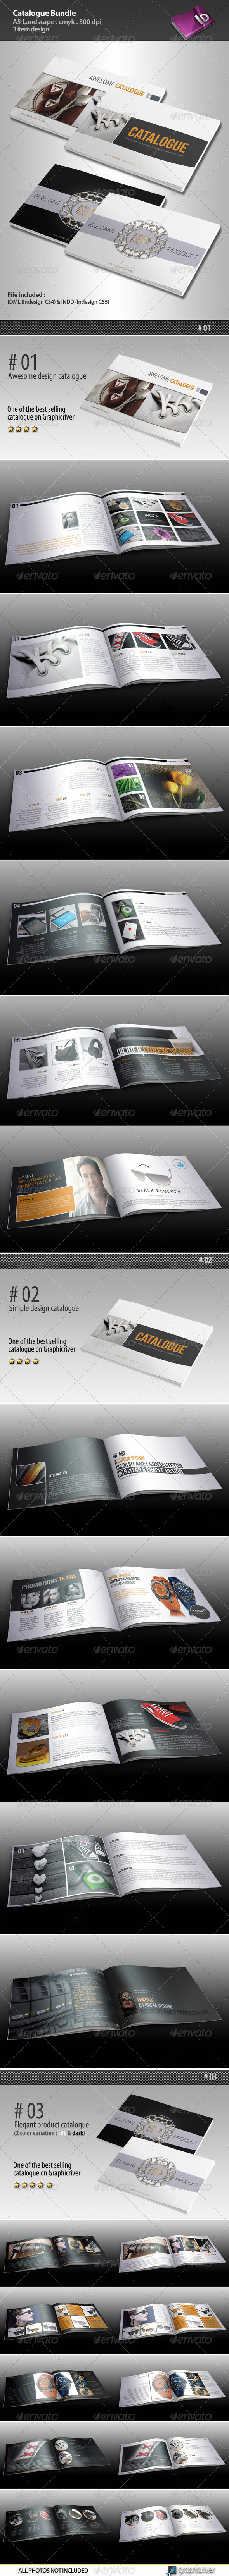 GraphicRiver Catalogue Bundle 3519540